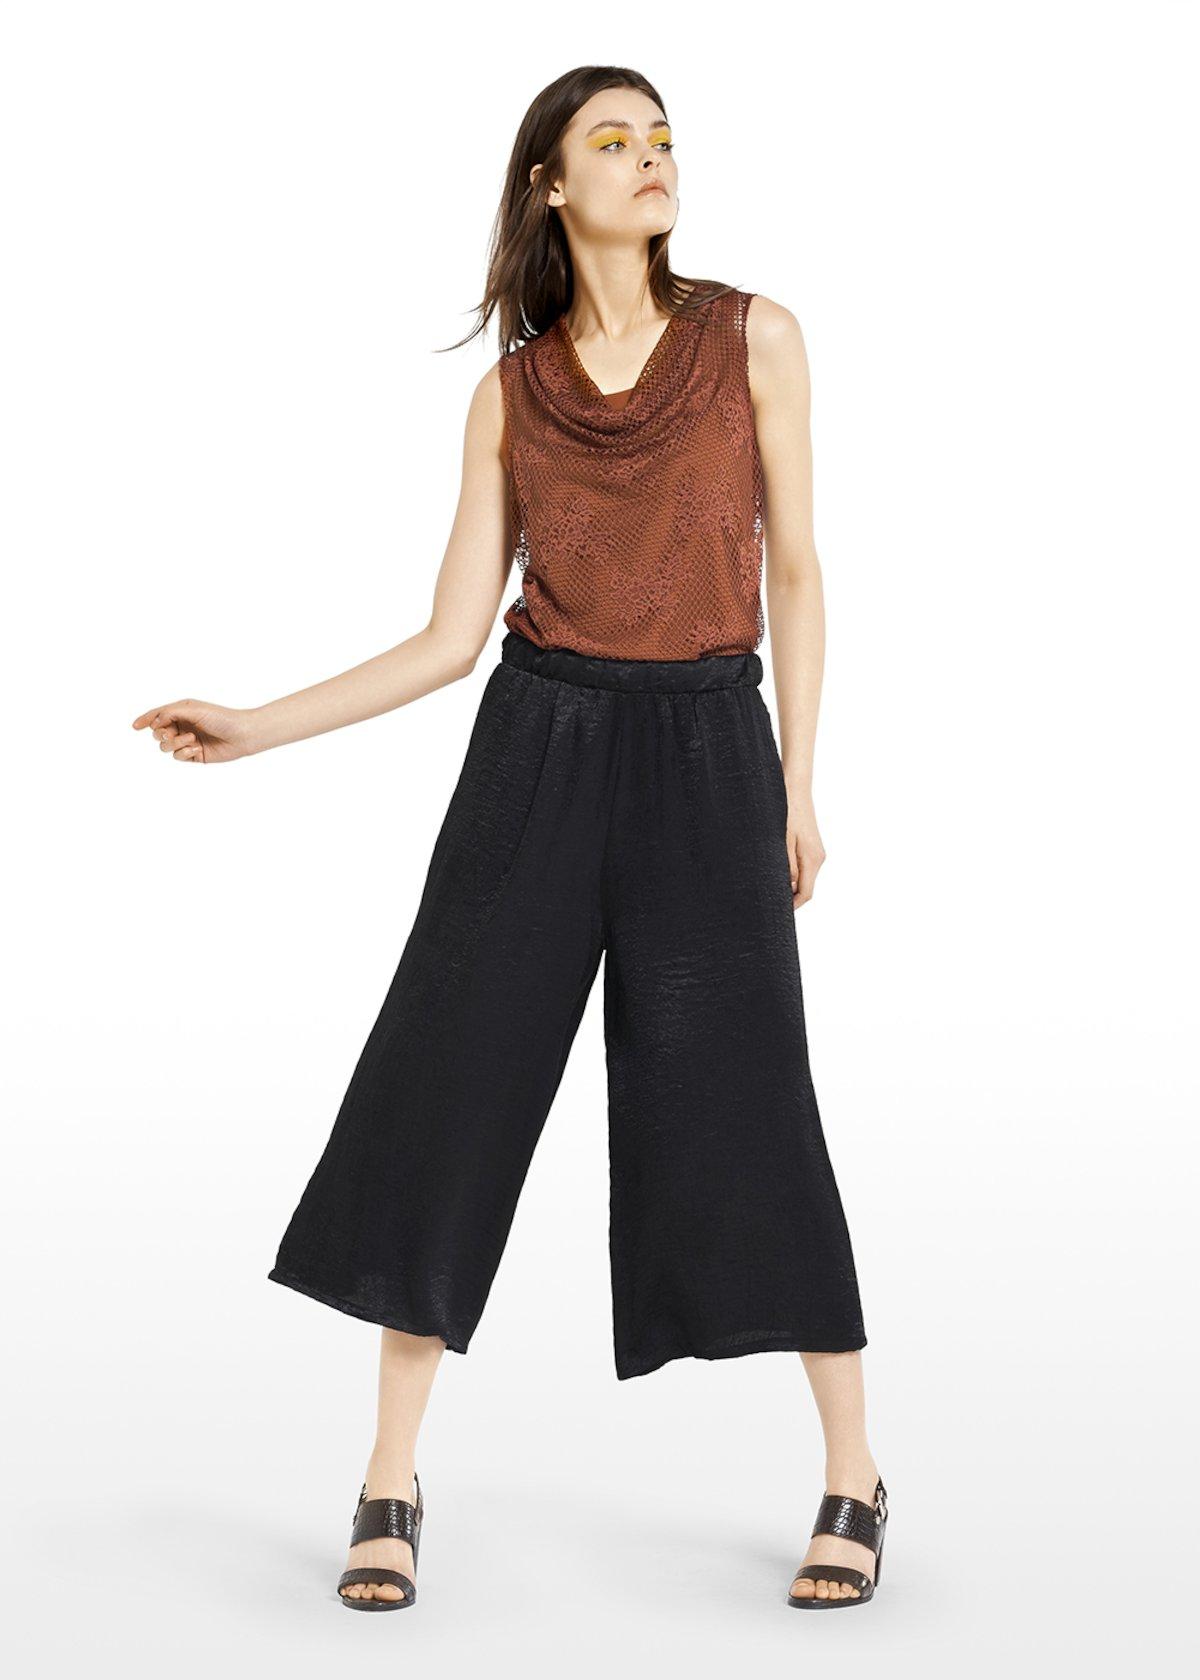 Megan model trousers satin effect - Black - Woman - Category image